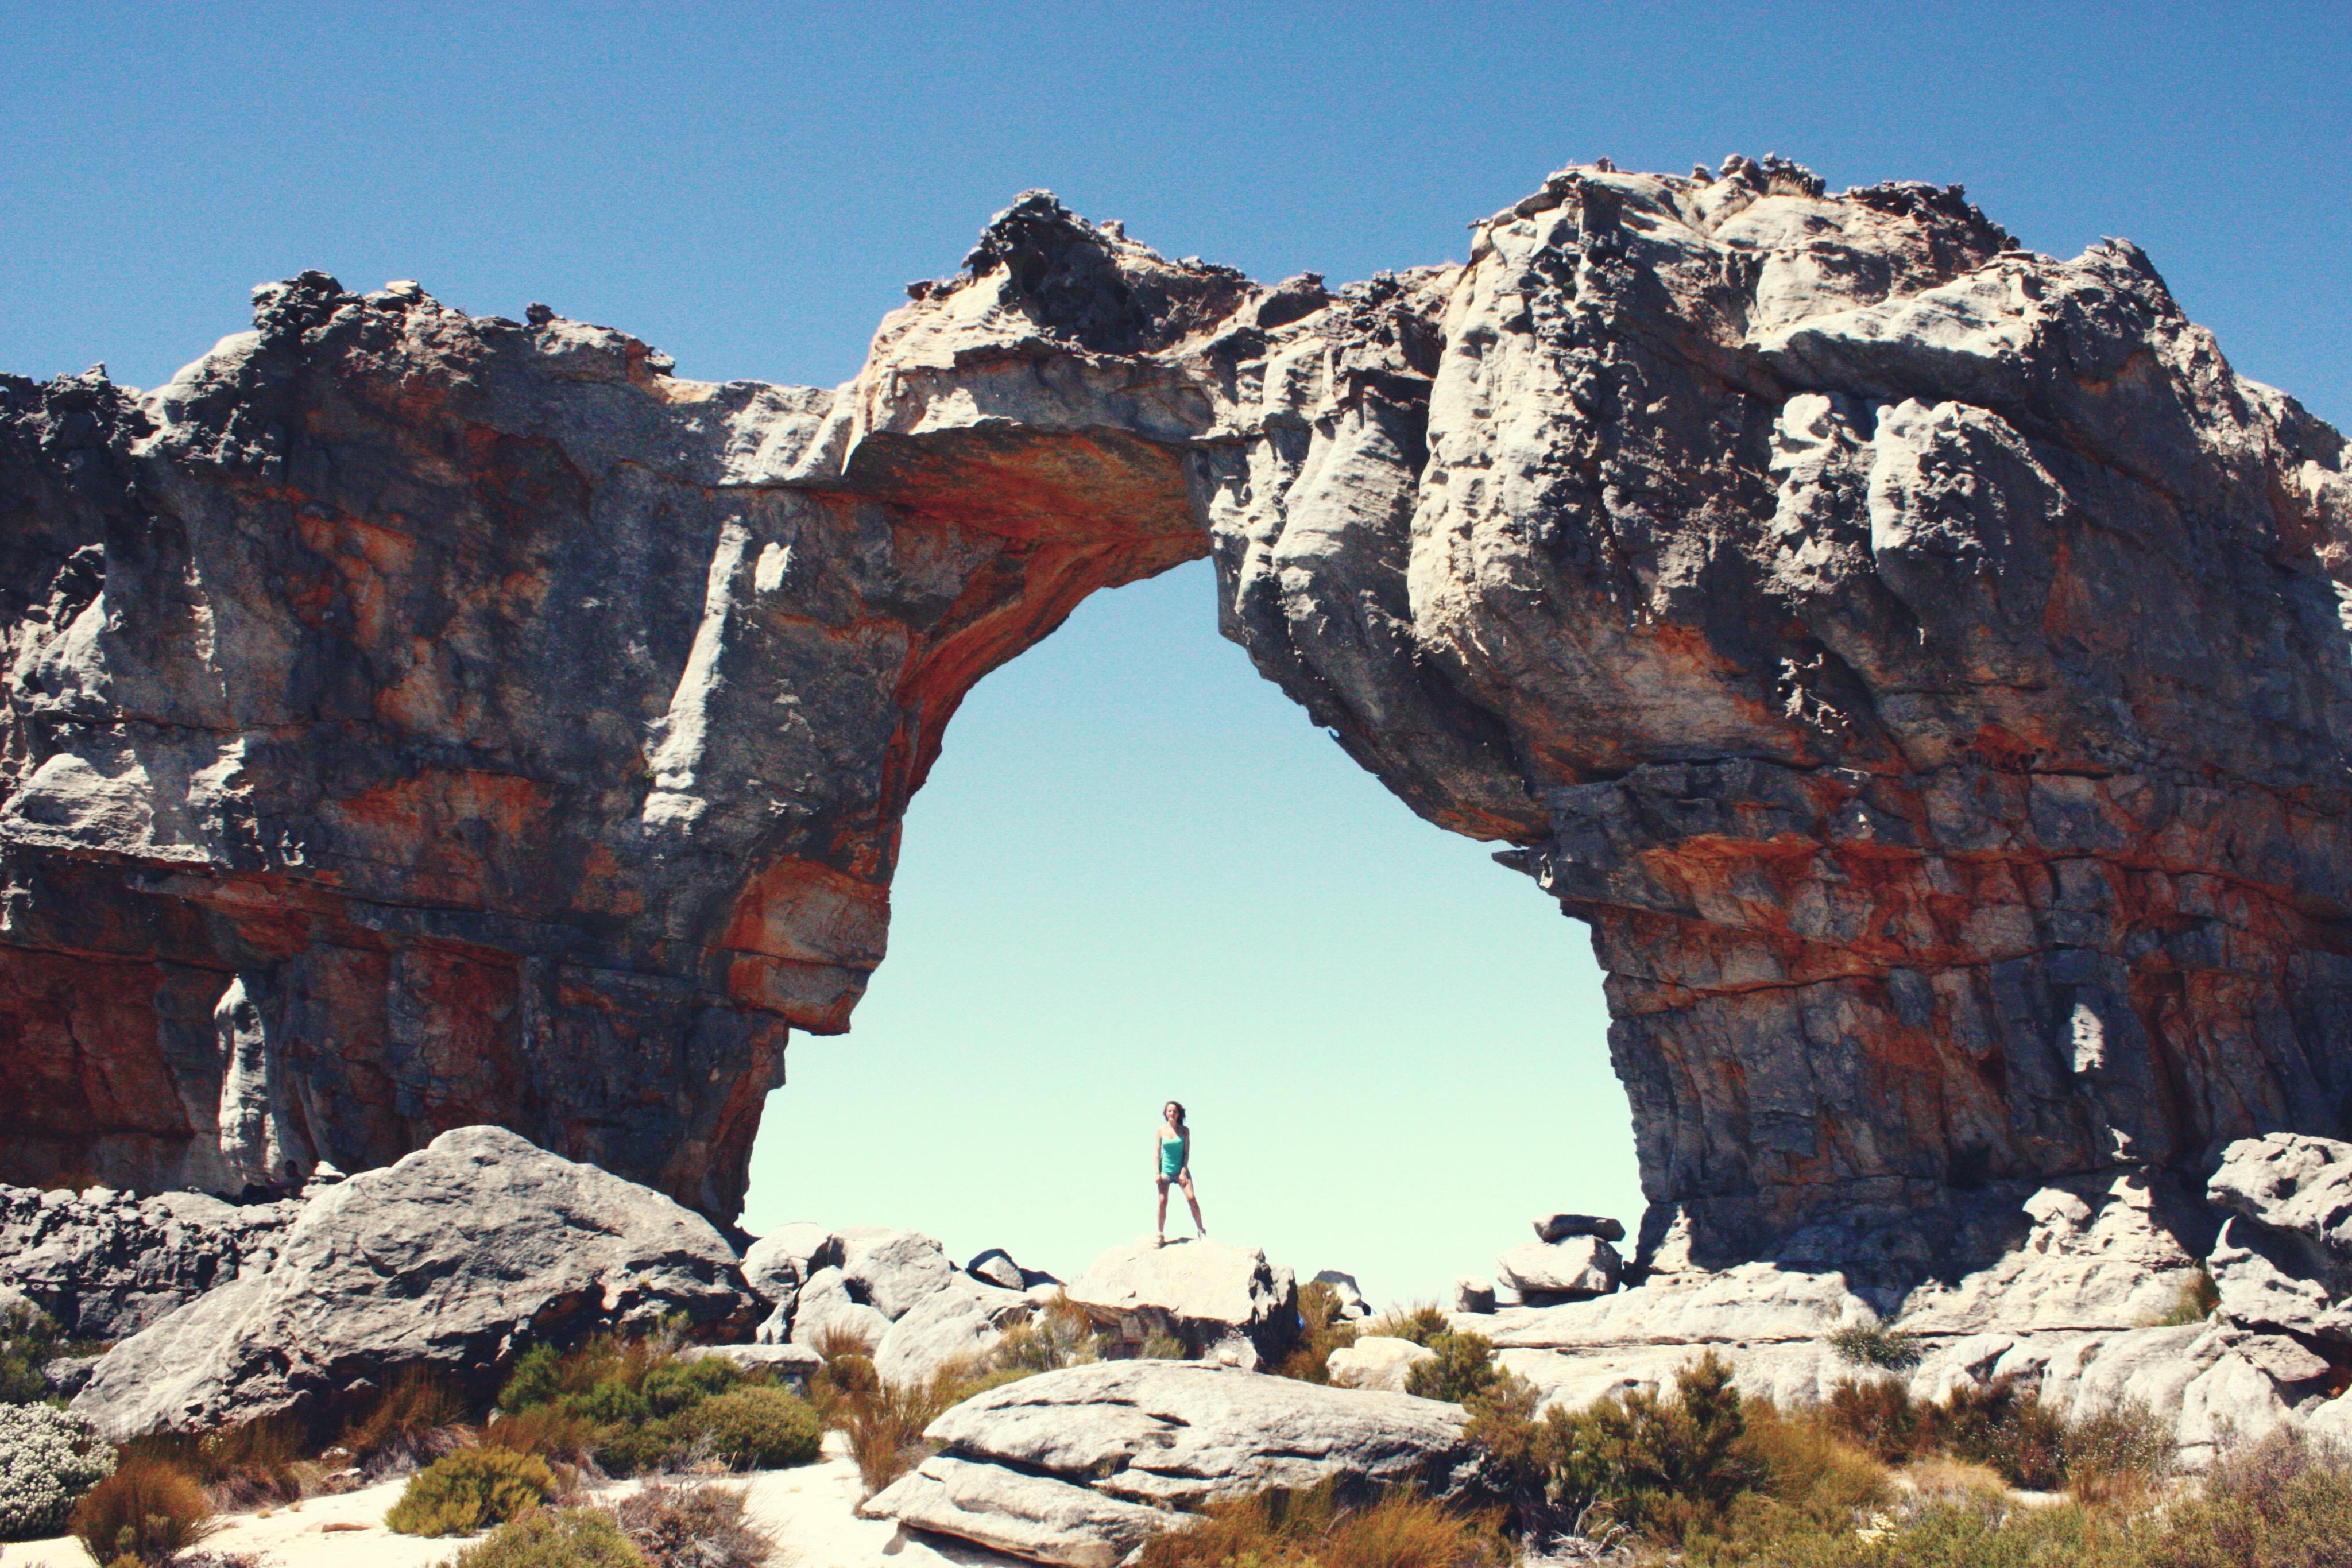 Travel Diary Sederbergen Zuid-Afrika 16